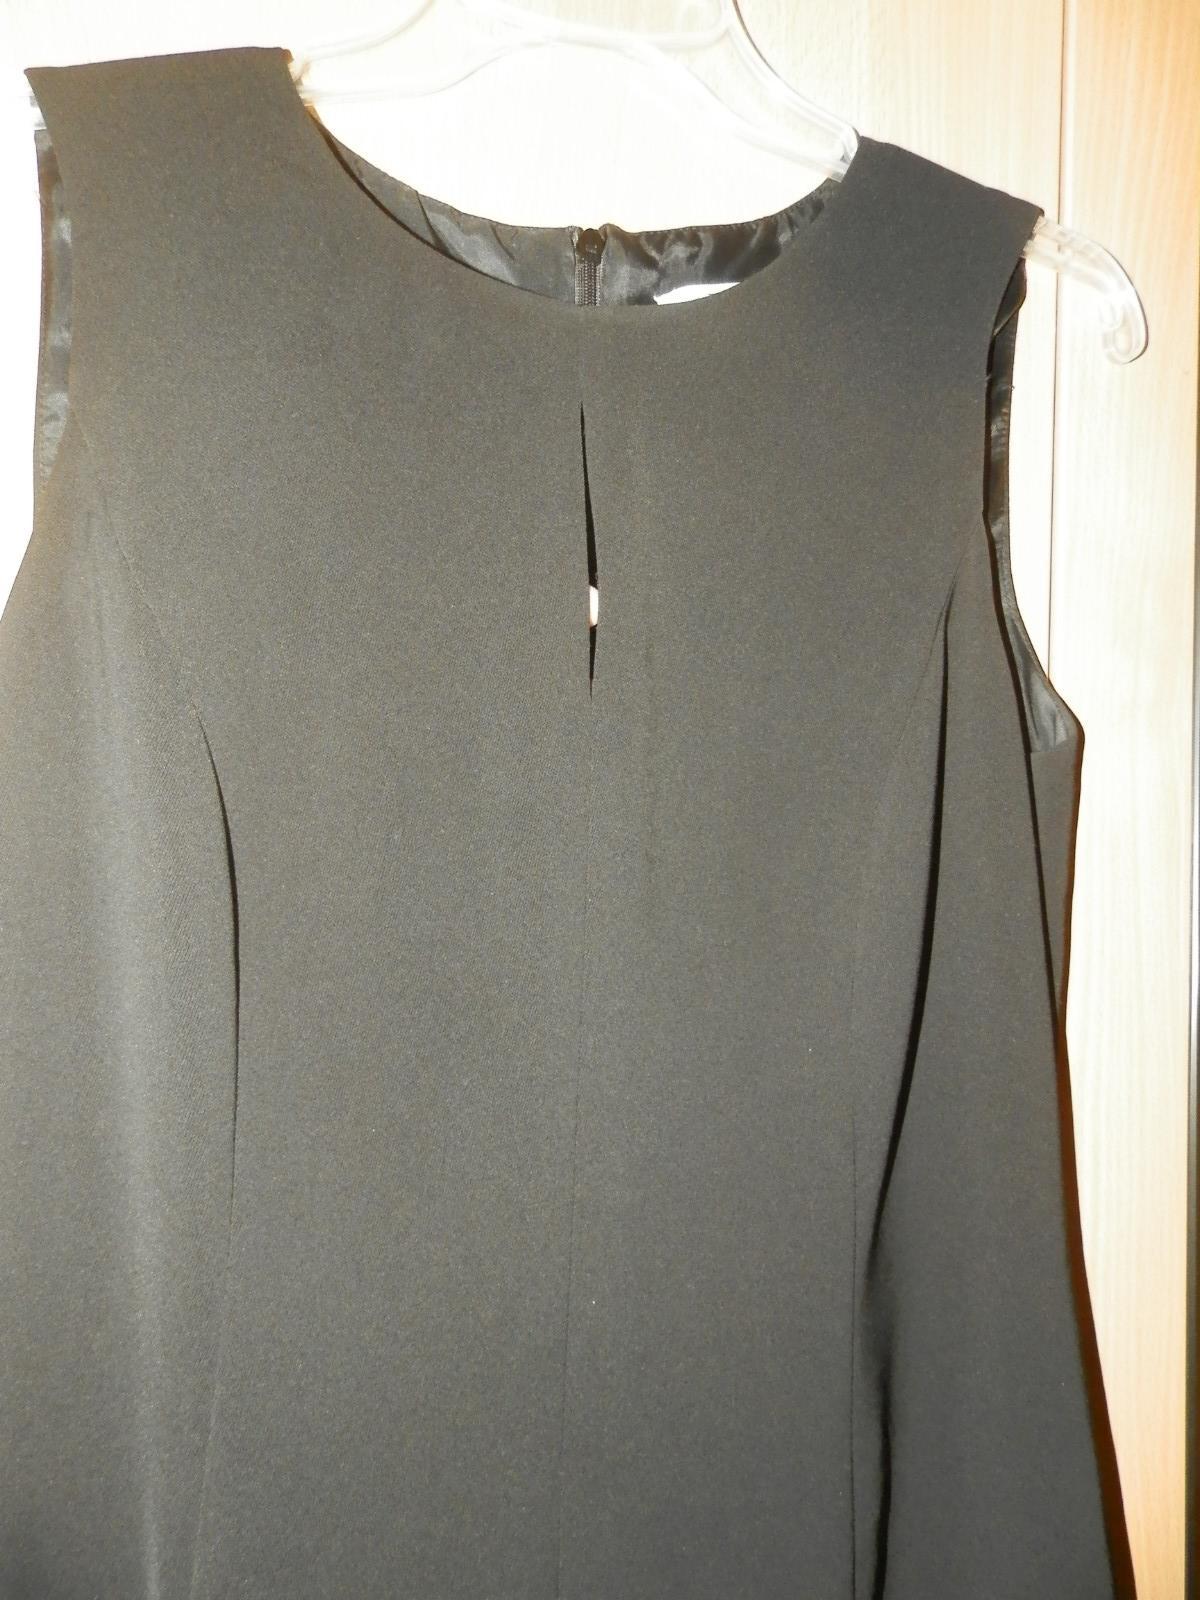 J.TAYLOR elegantné šaty M/L - Obrázok č. 4